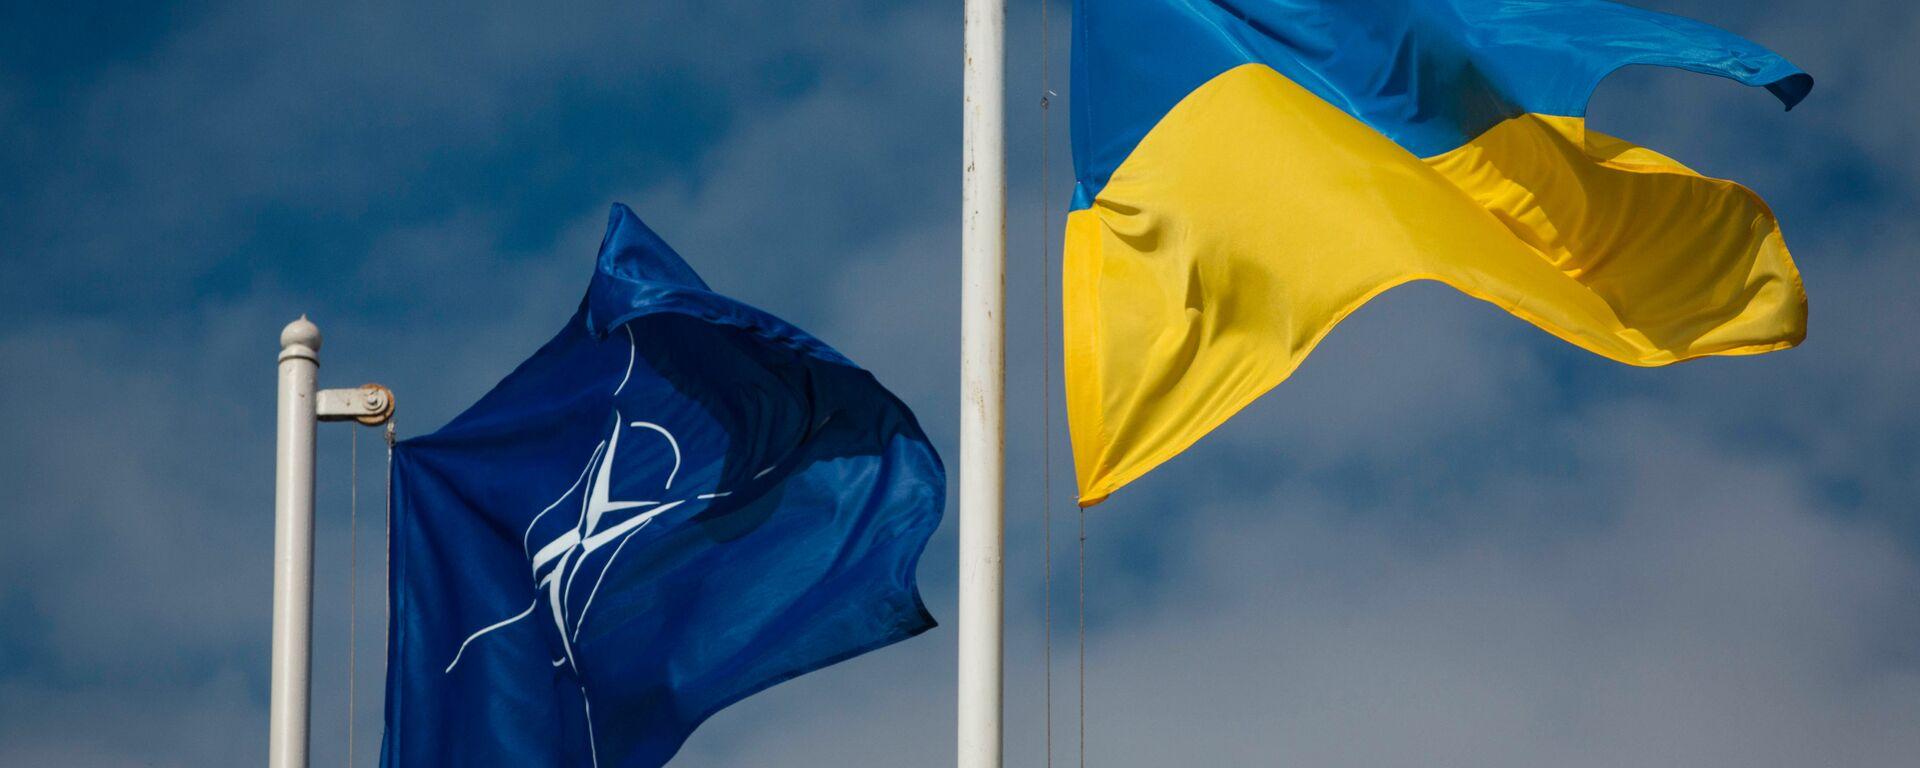 Las banderas de la OTAN y Ucrania - Sputnik Mundo, 1920, 24.05.2021